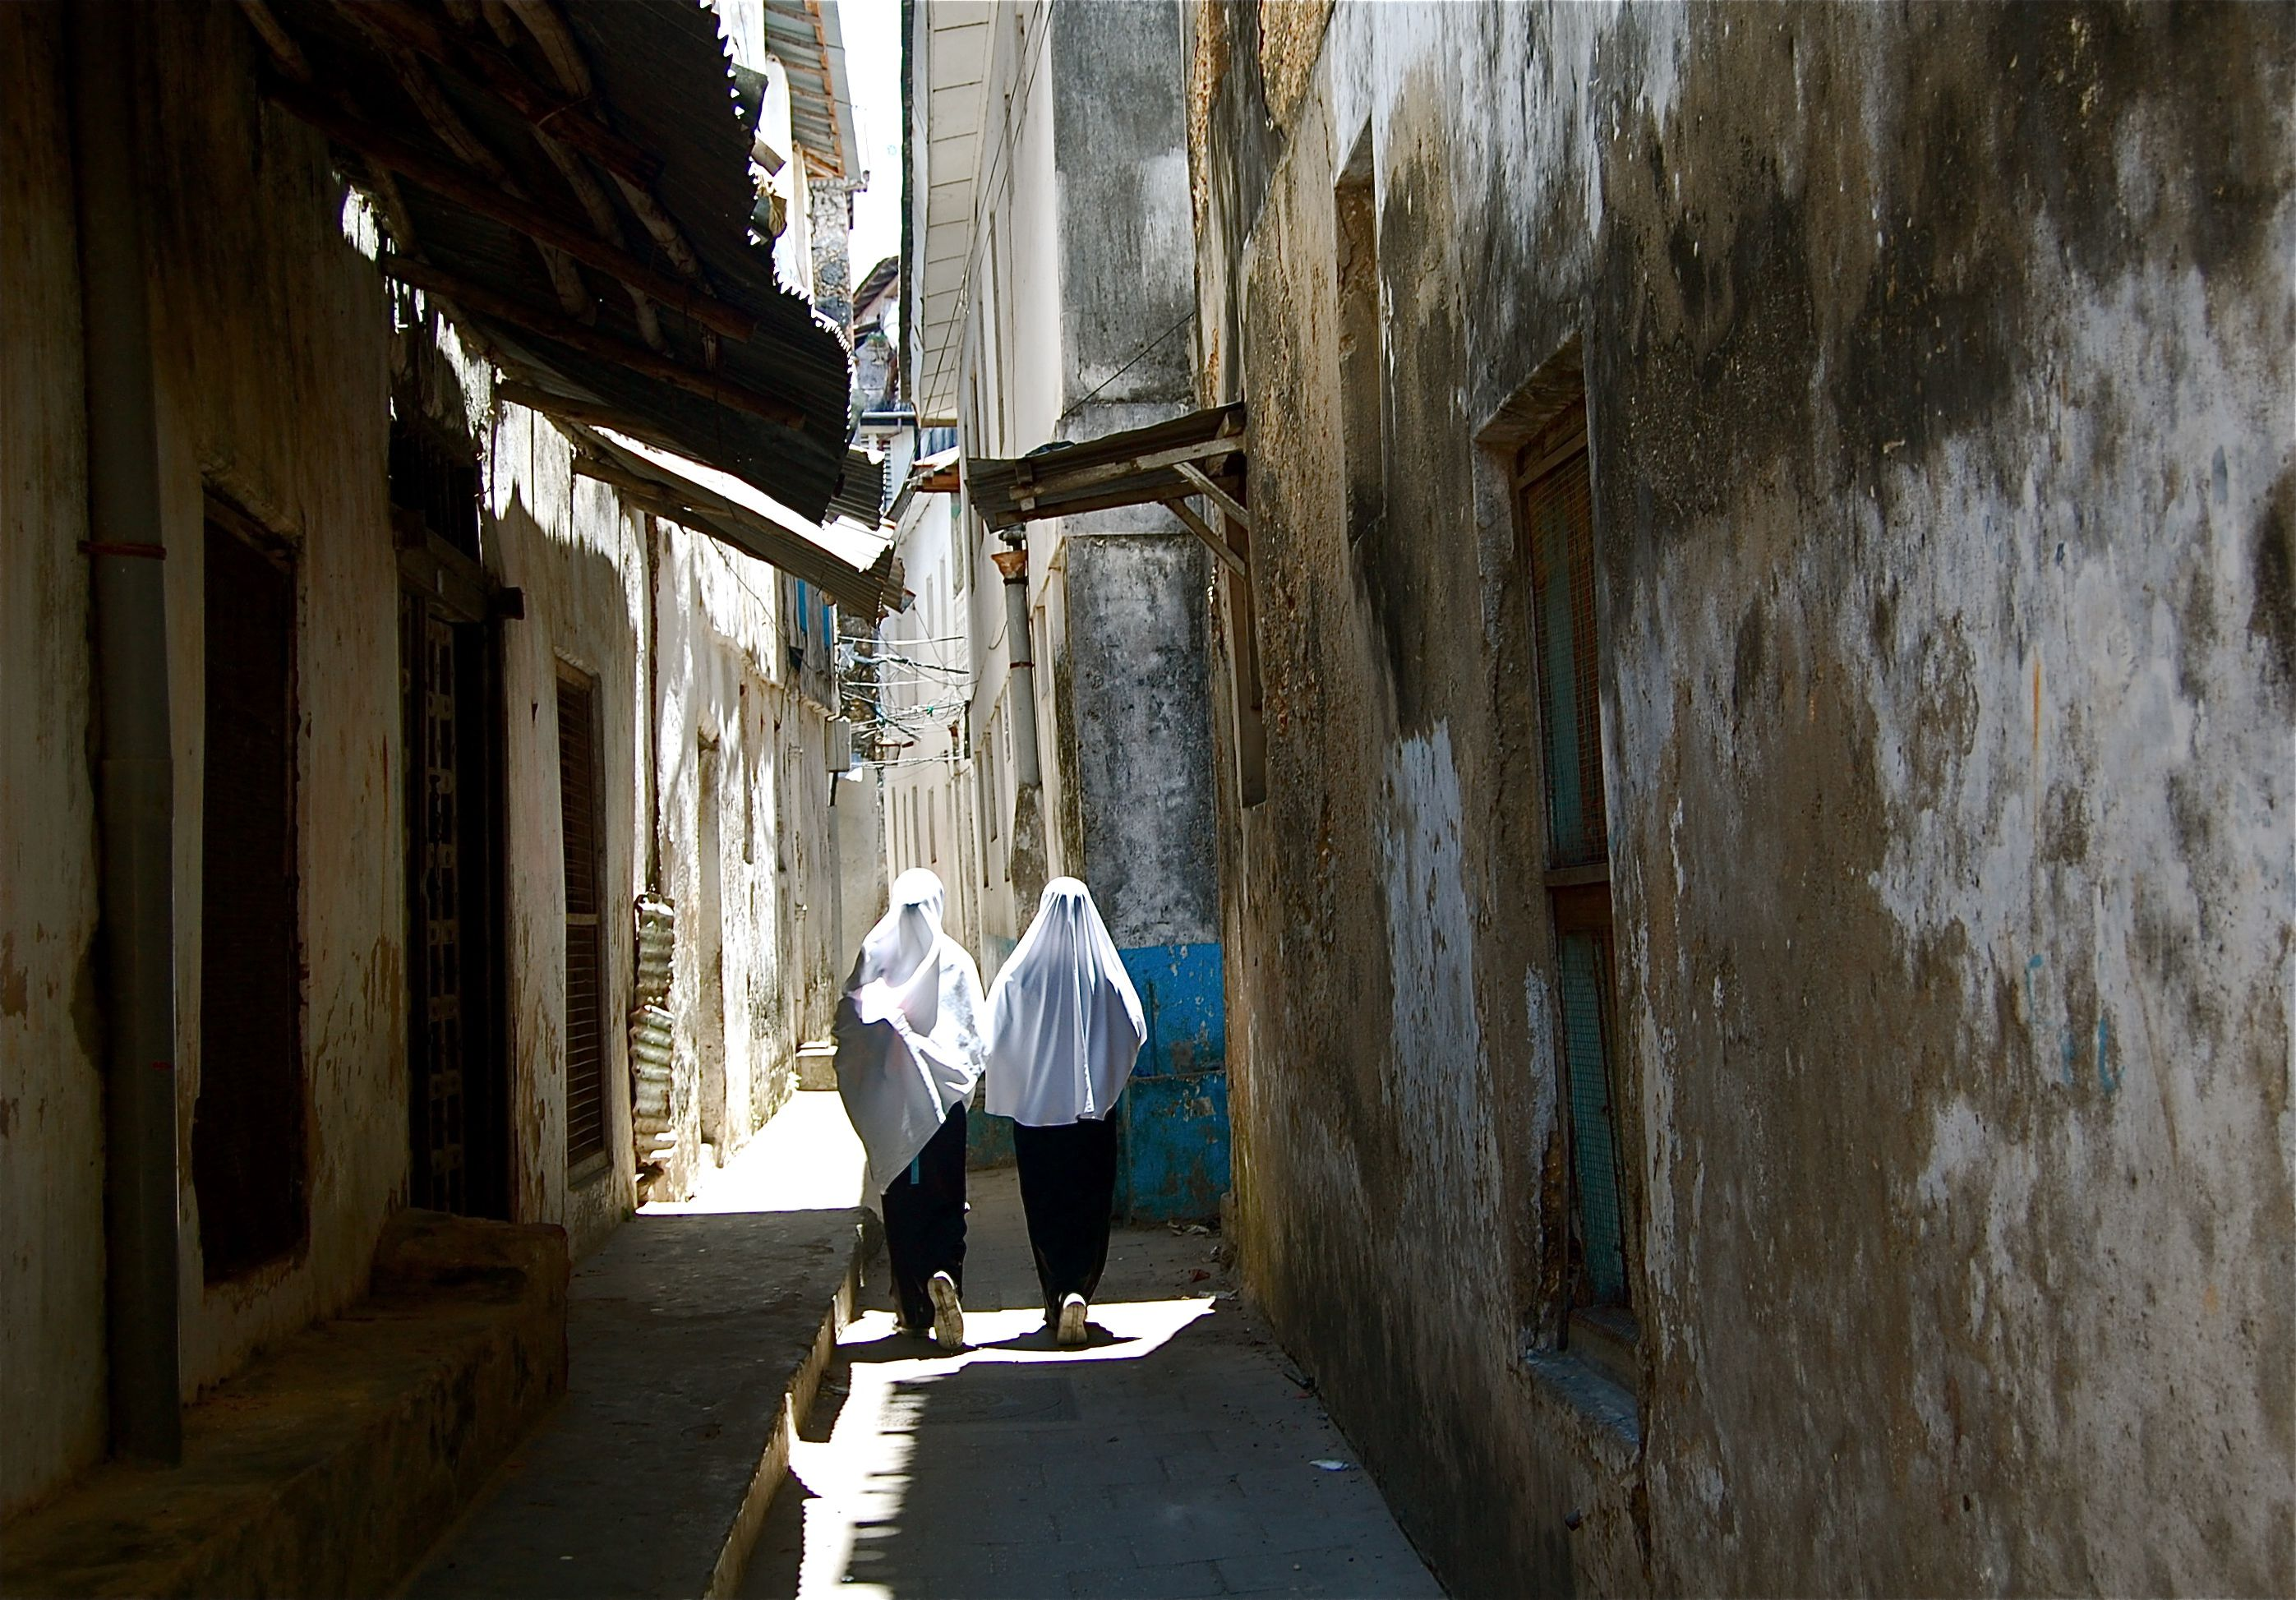 Streets in Stone Town, Zanzibar